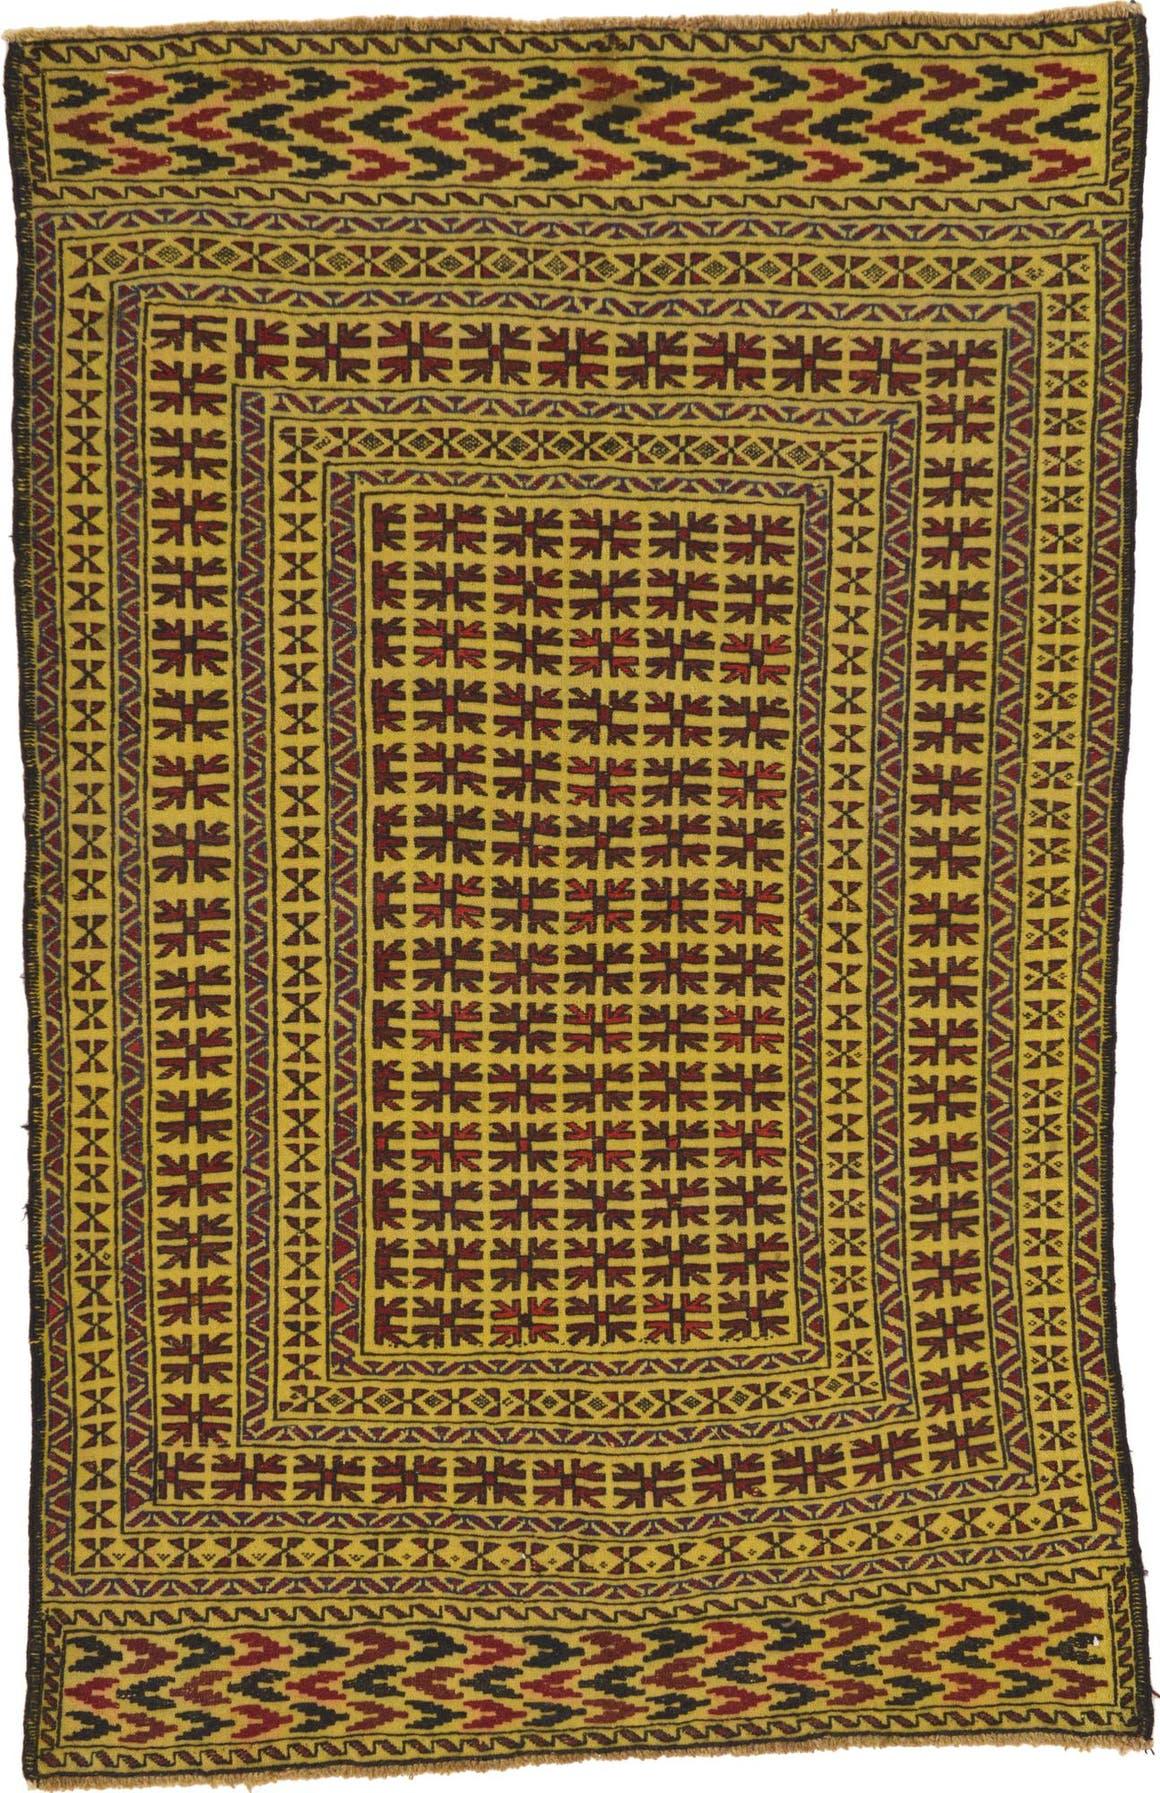 4' 2 x 6' 6 Kilim Afghan Rug main image